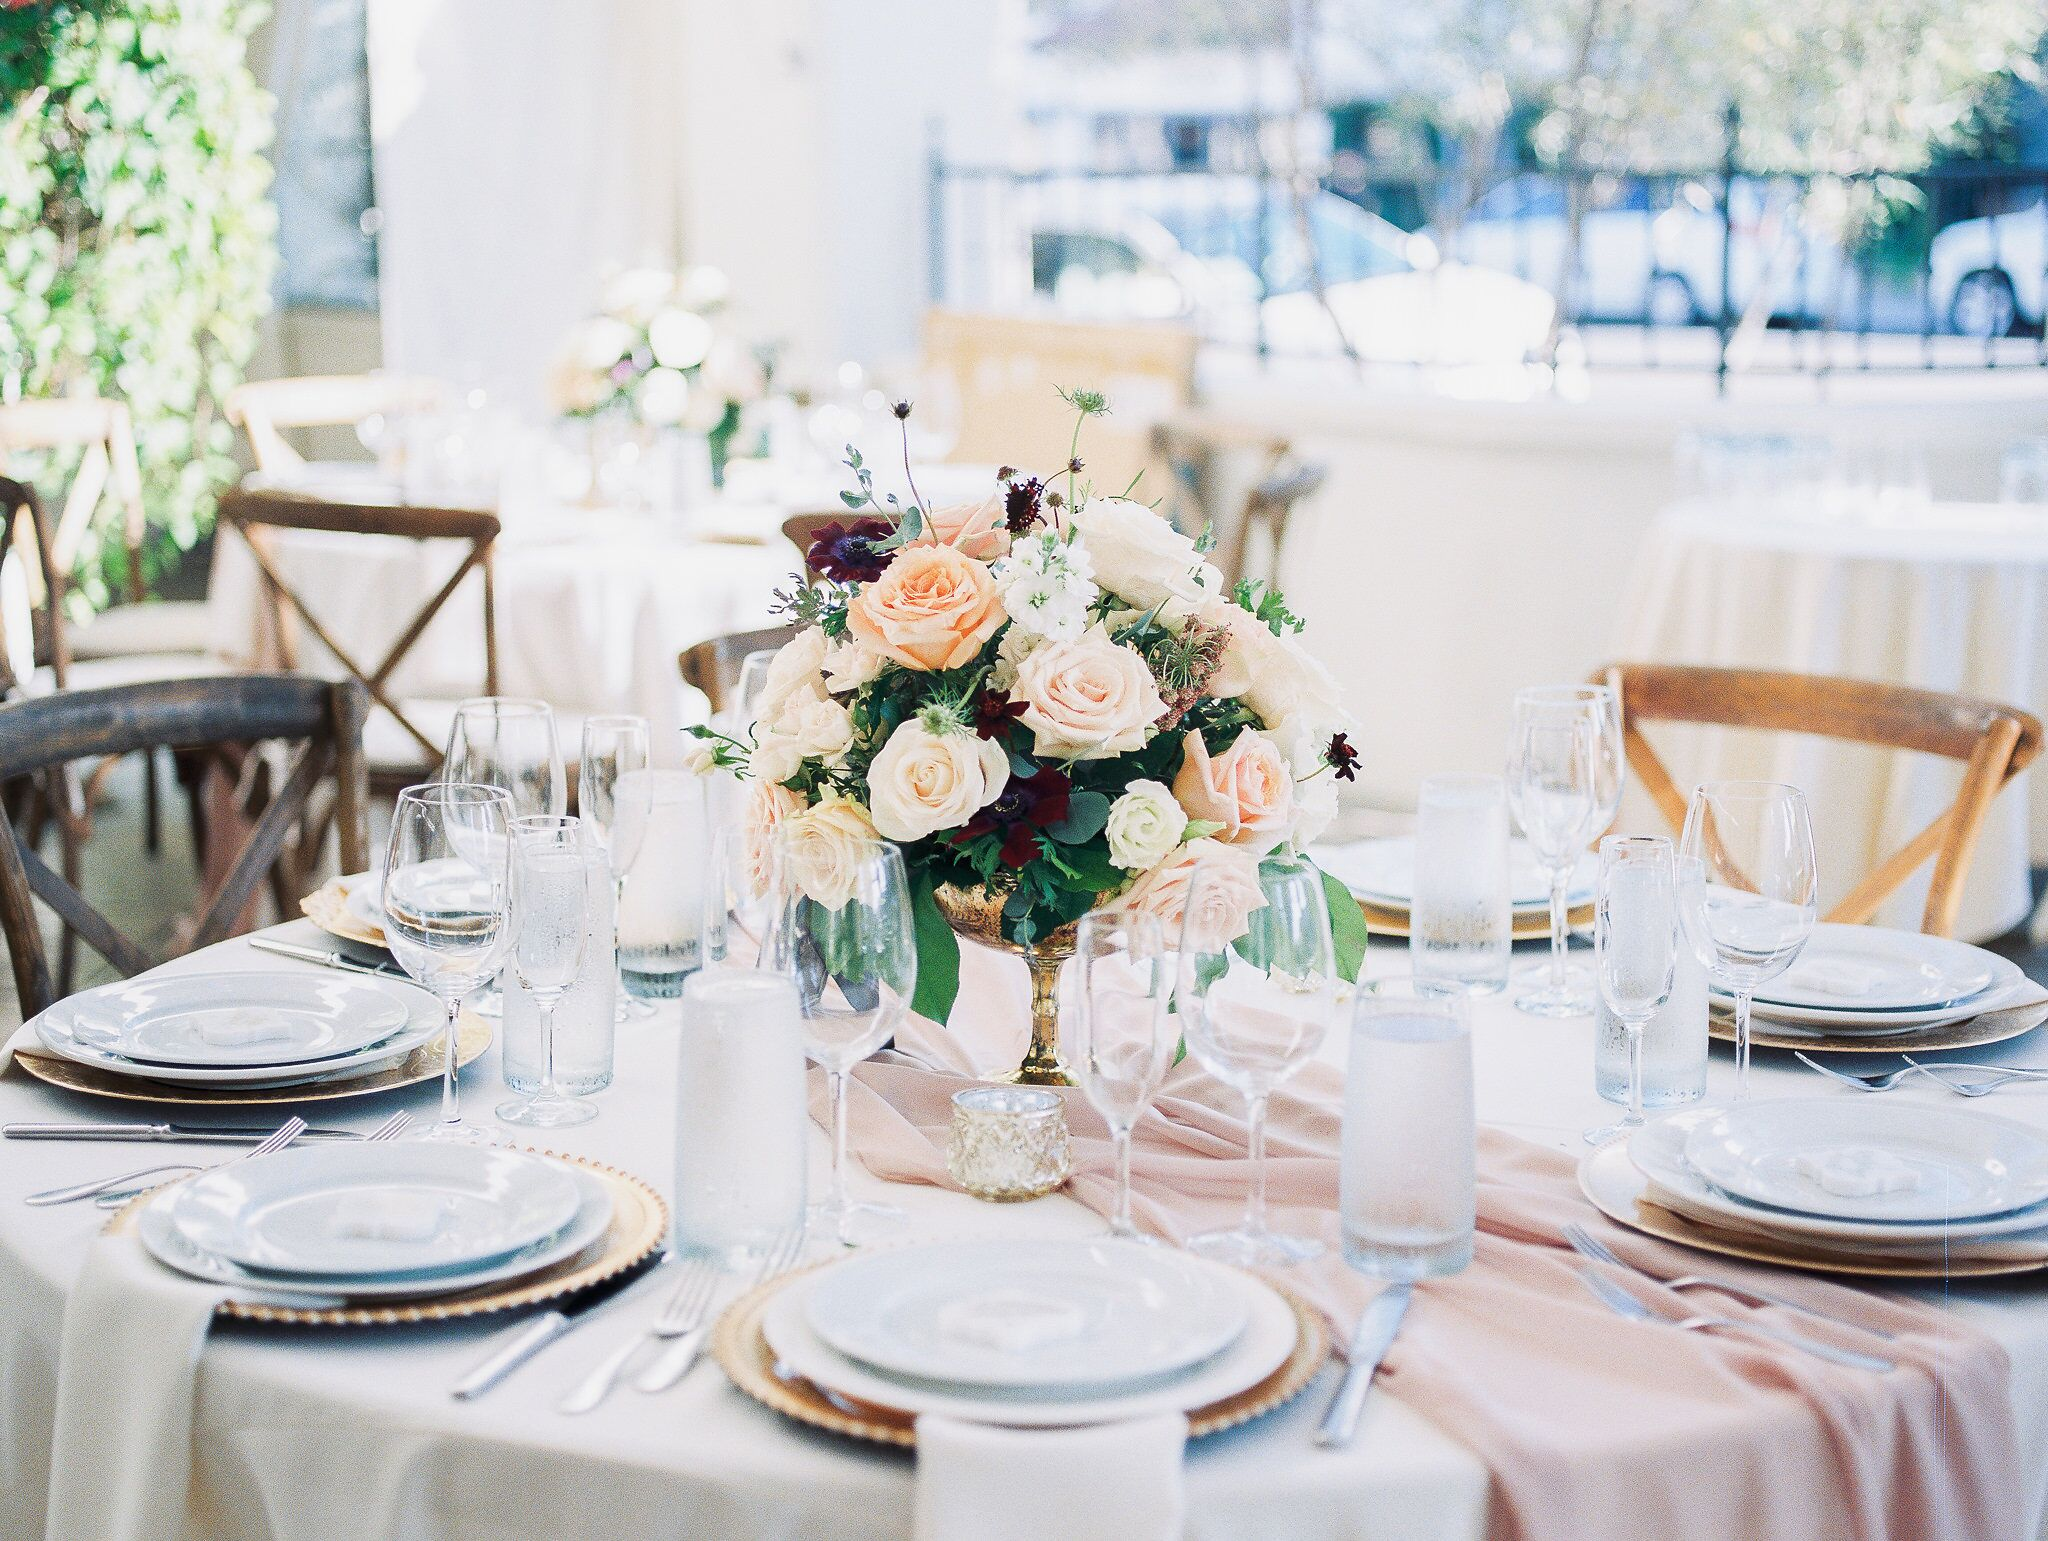 www.santabarbaraweddings.com | Photographer: Grace Kathryn | Venues: Villa & Vine, Santa Barbara Courthouse, Hilton Santa Barbara Resort | Coordination: Burlap & Bordeaux | Tablescape